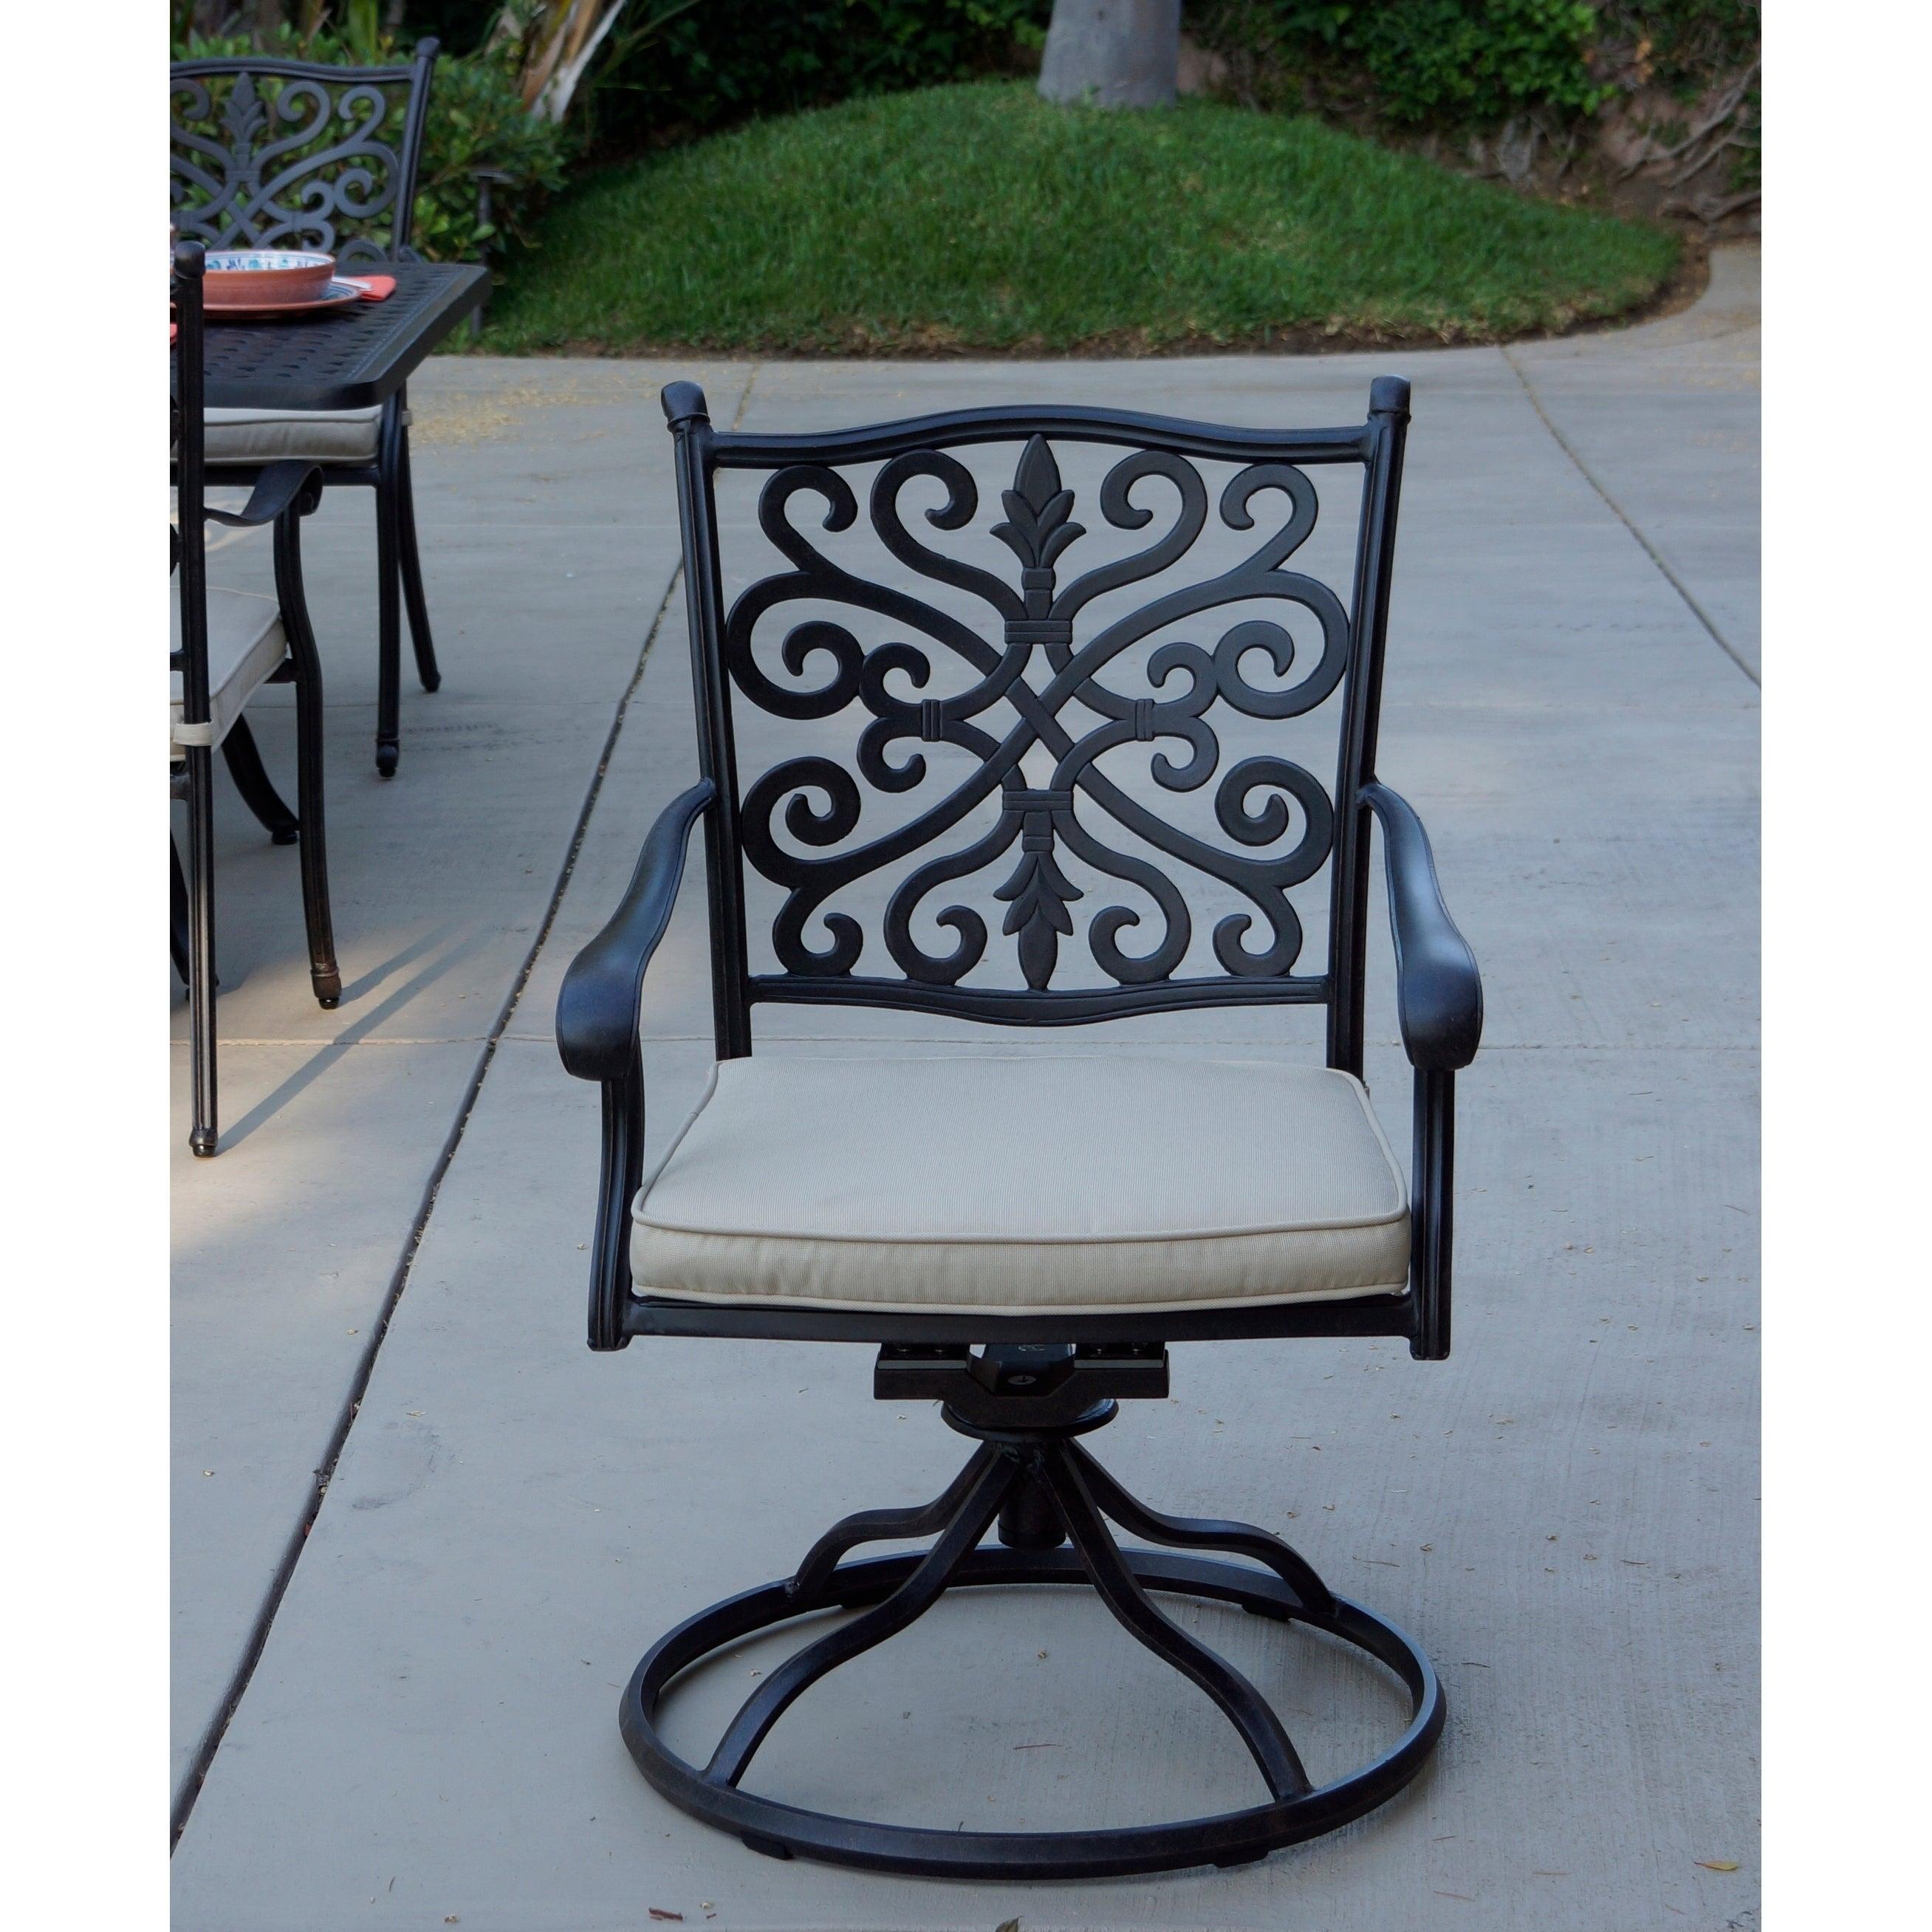 Patio Swivel Rocker Dining Chairs